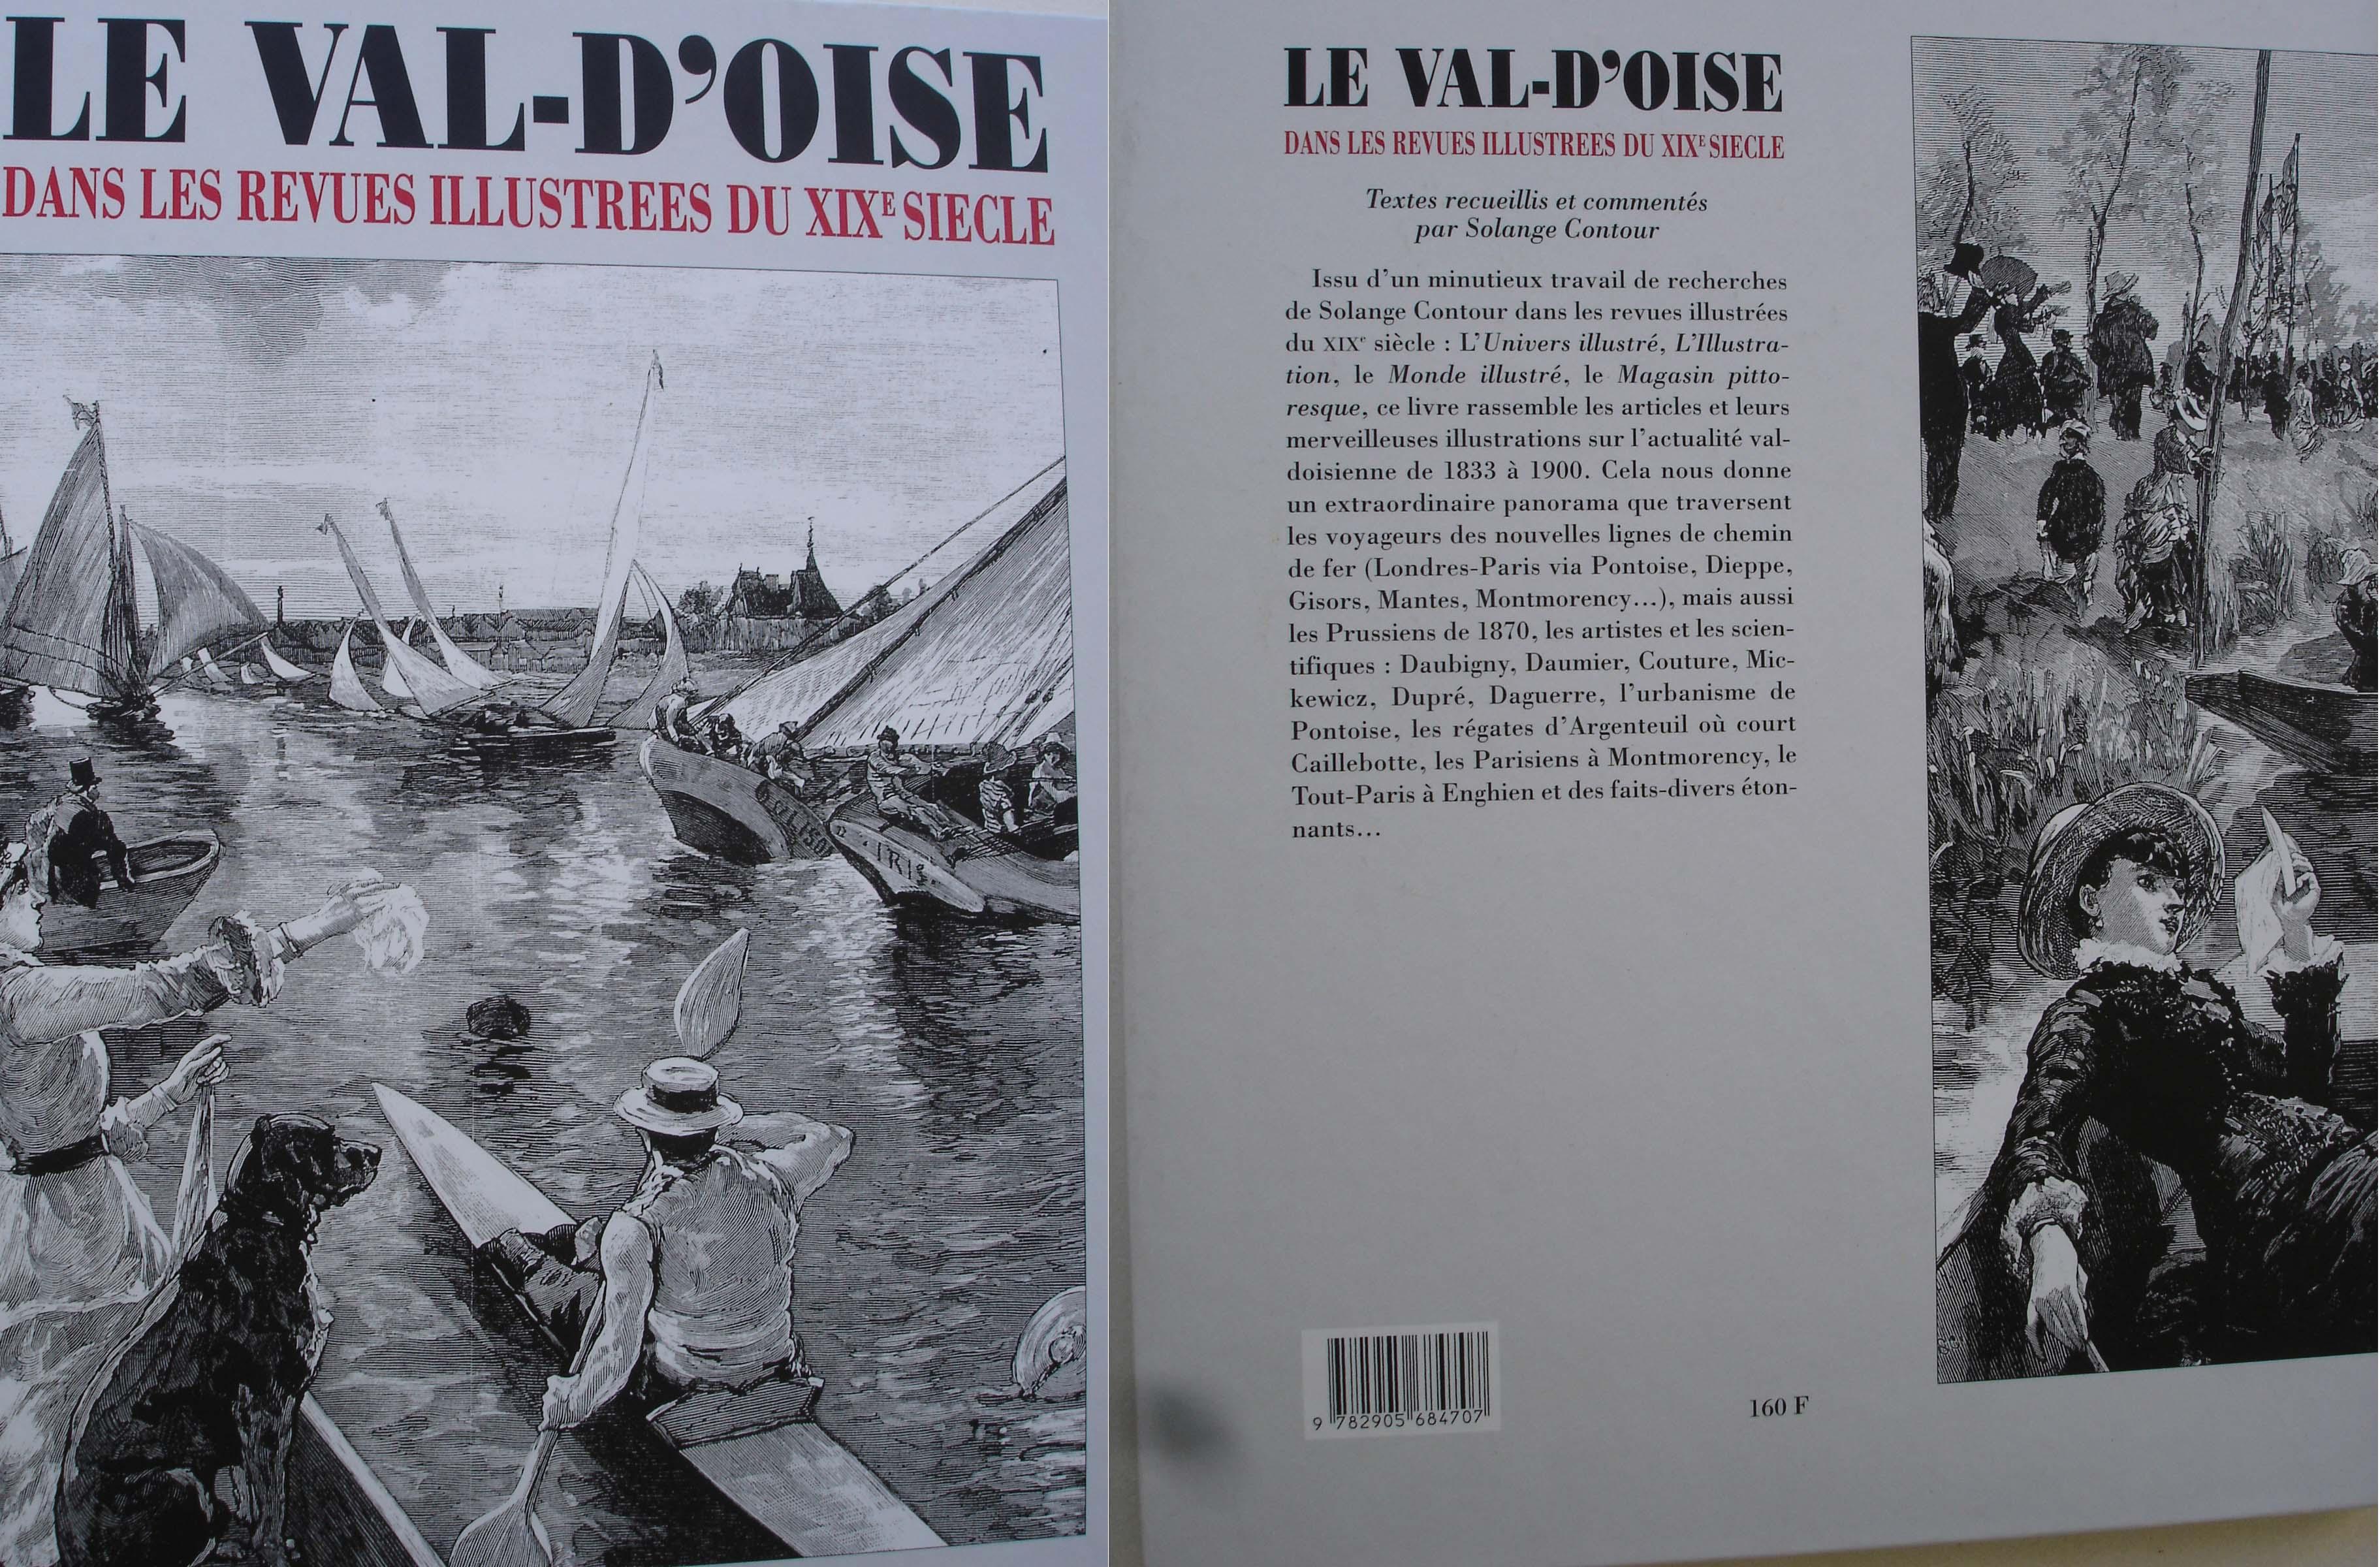 Horticulteur Val D Oise val d'oise